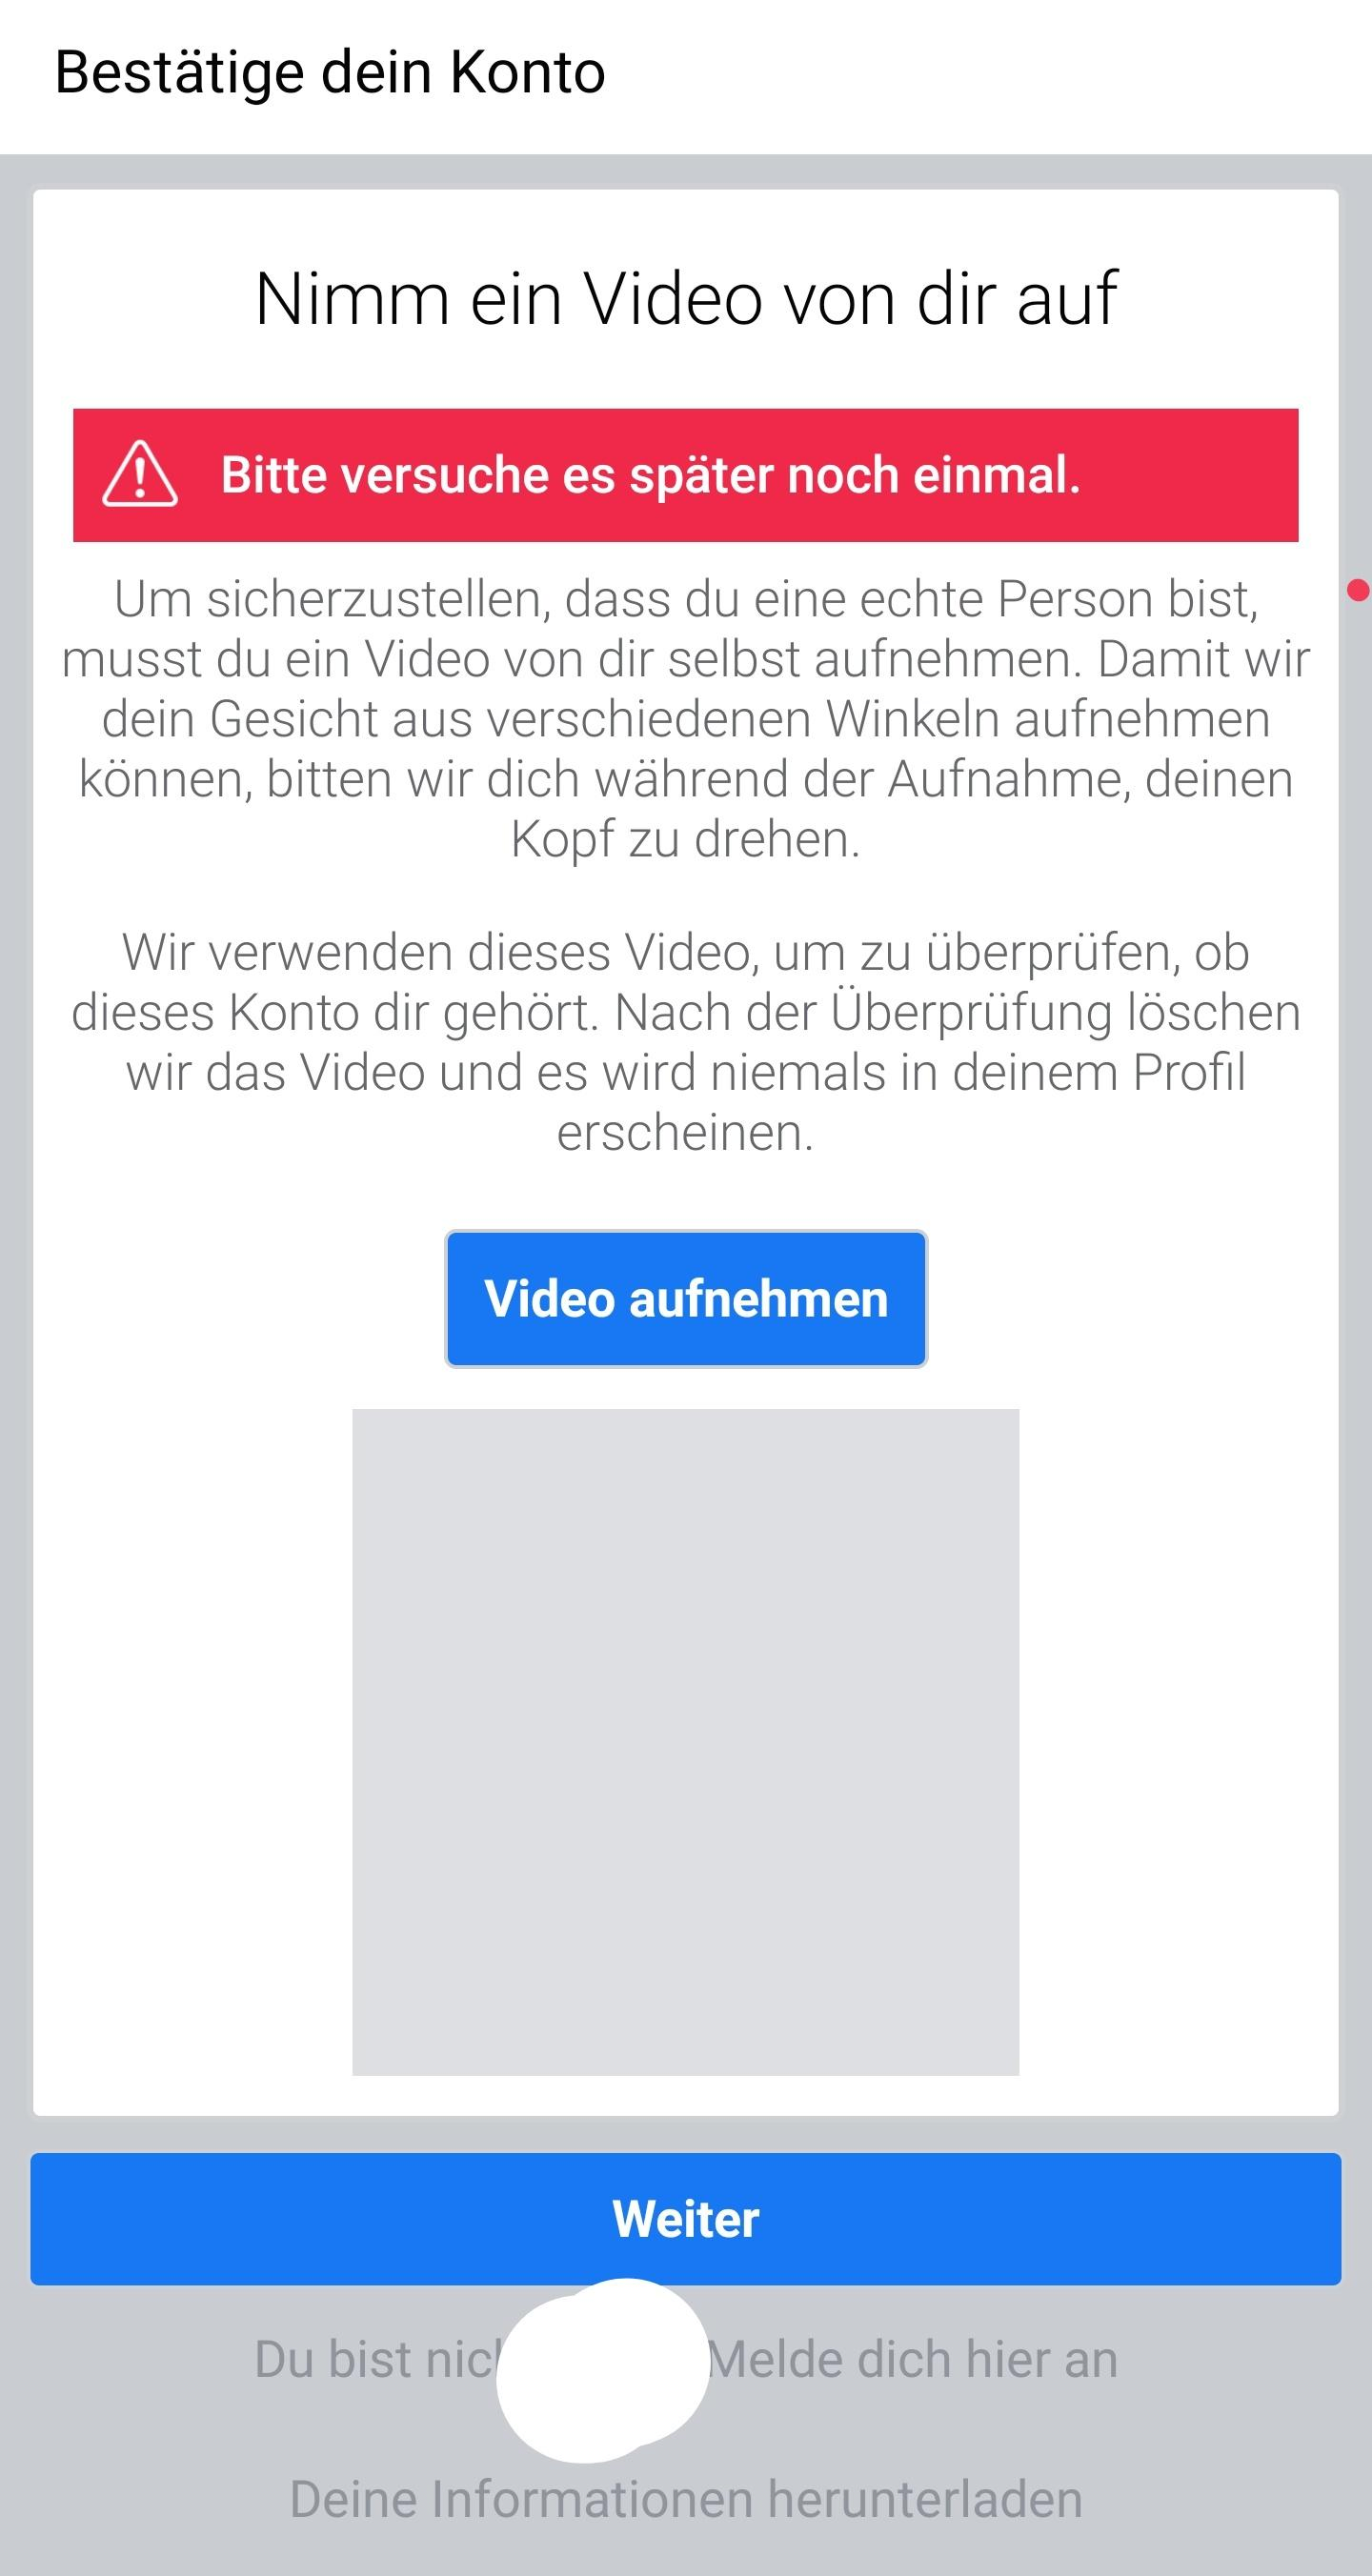 Facebook Identität Bestätigen